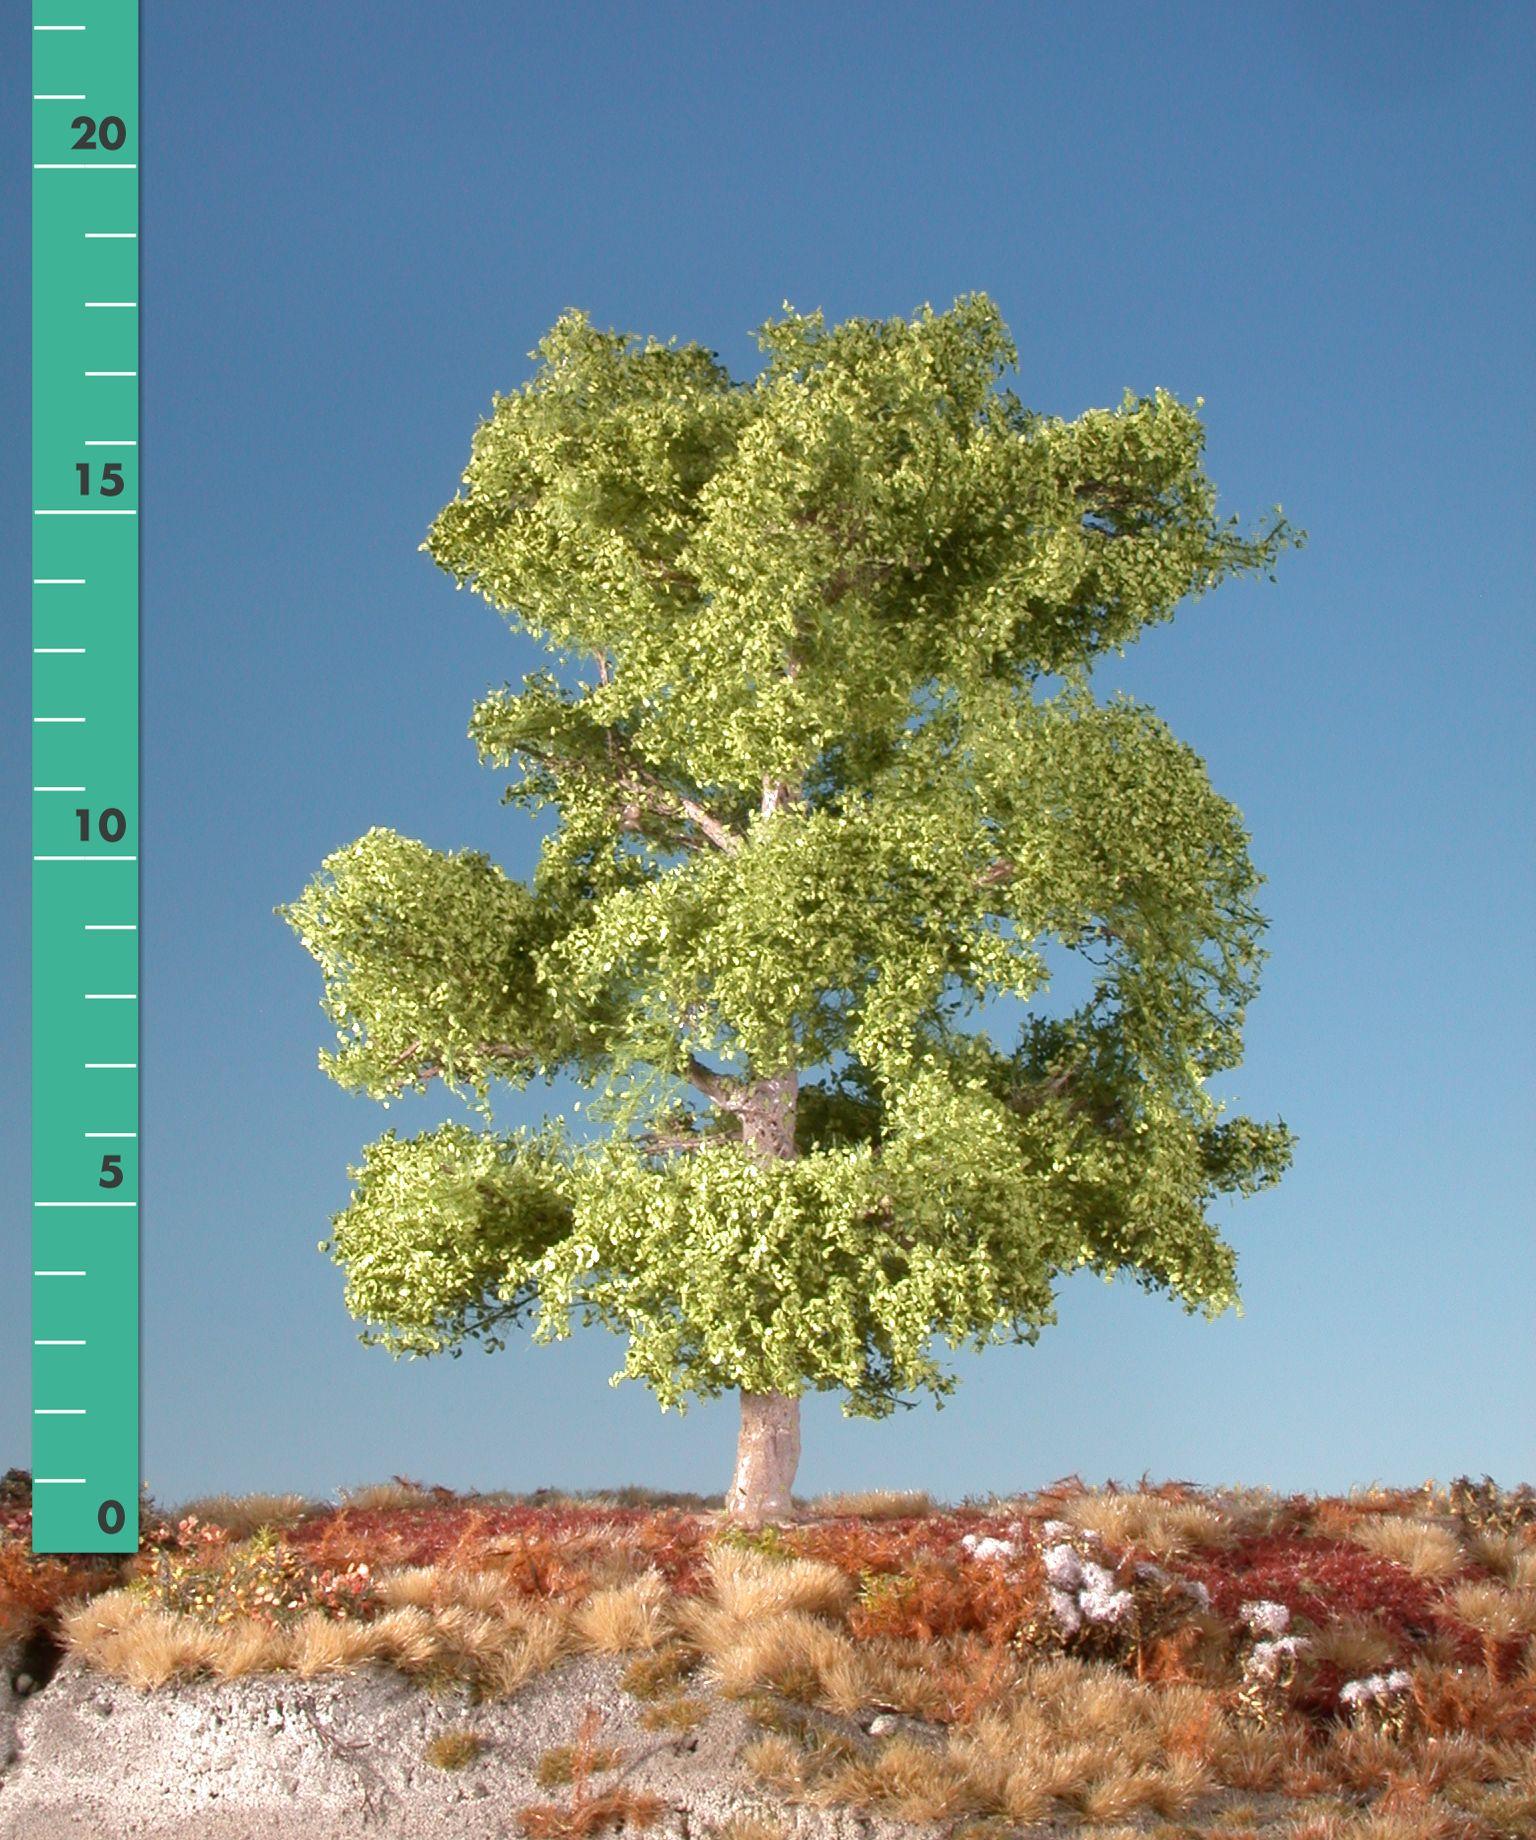 buche 1 160 220 fr hling modellbaum miniaturmodelle b ume pflanzen belaubung. Black Bedroom Furniture Sets. Home Design Ideas